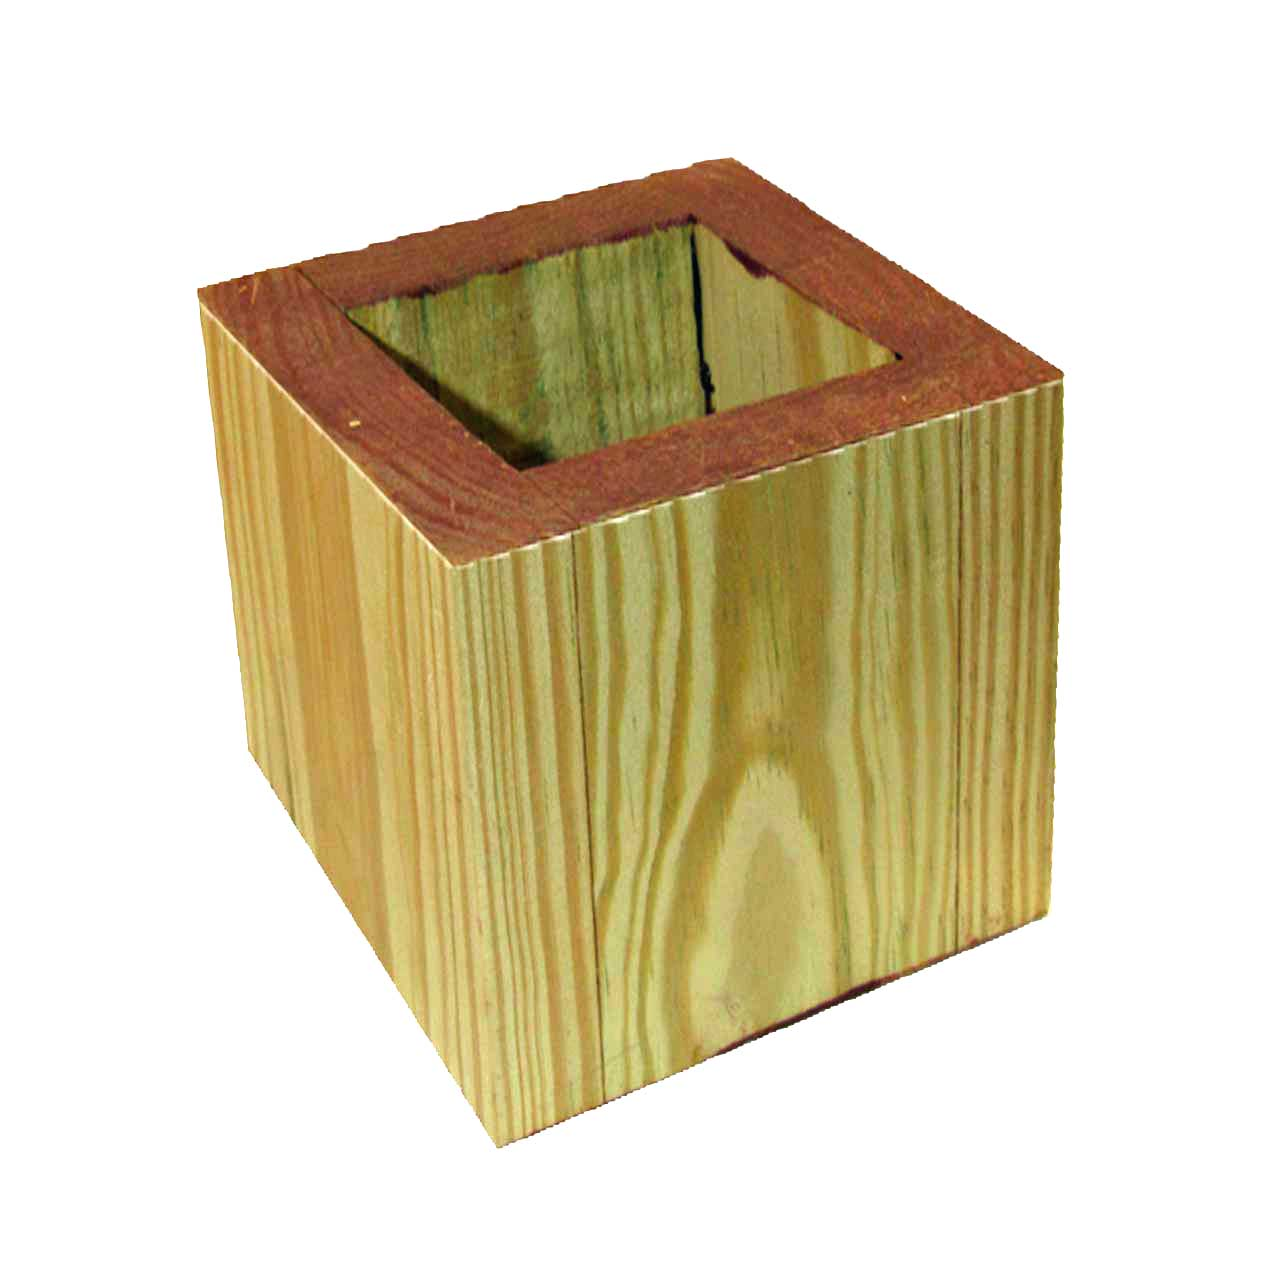 Laminated Hollow Ypt Timber Columns Capitol City Lumber